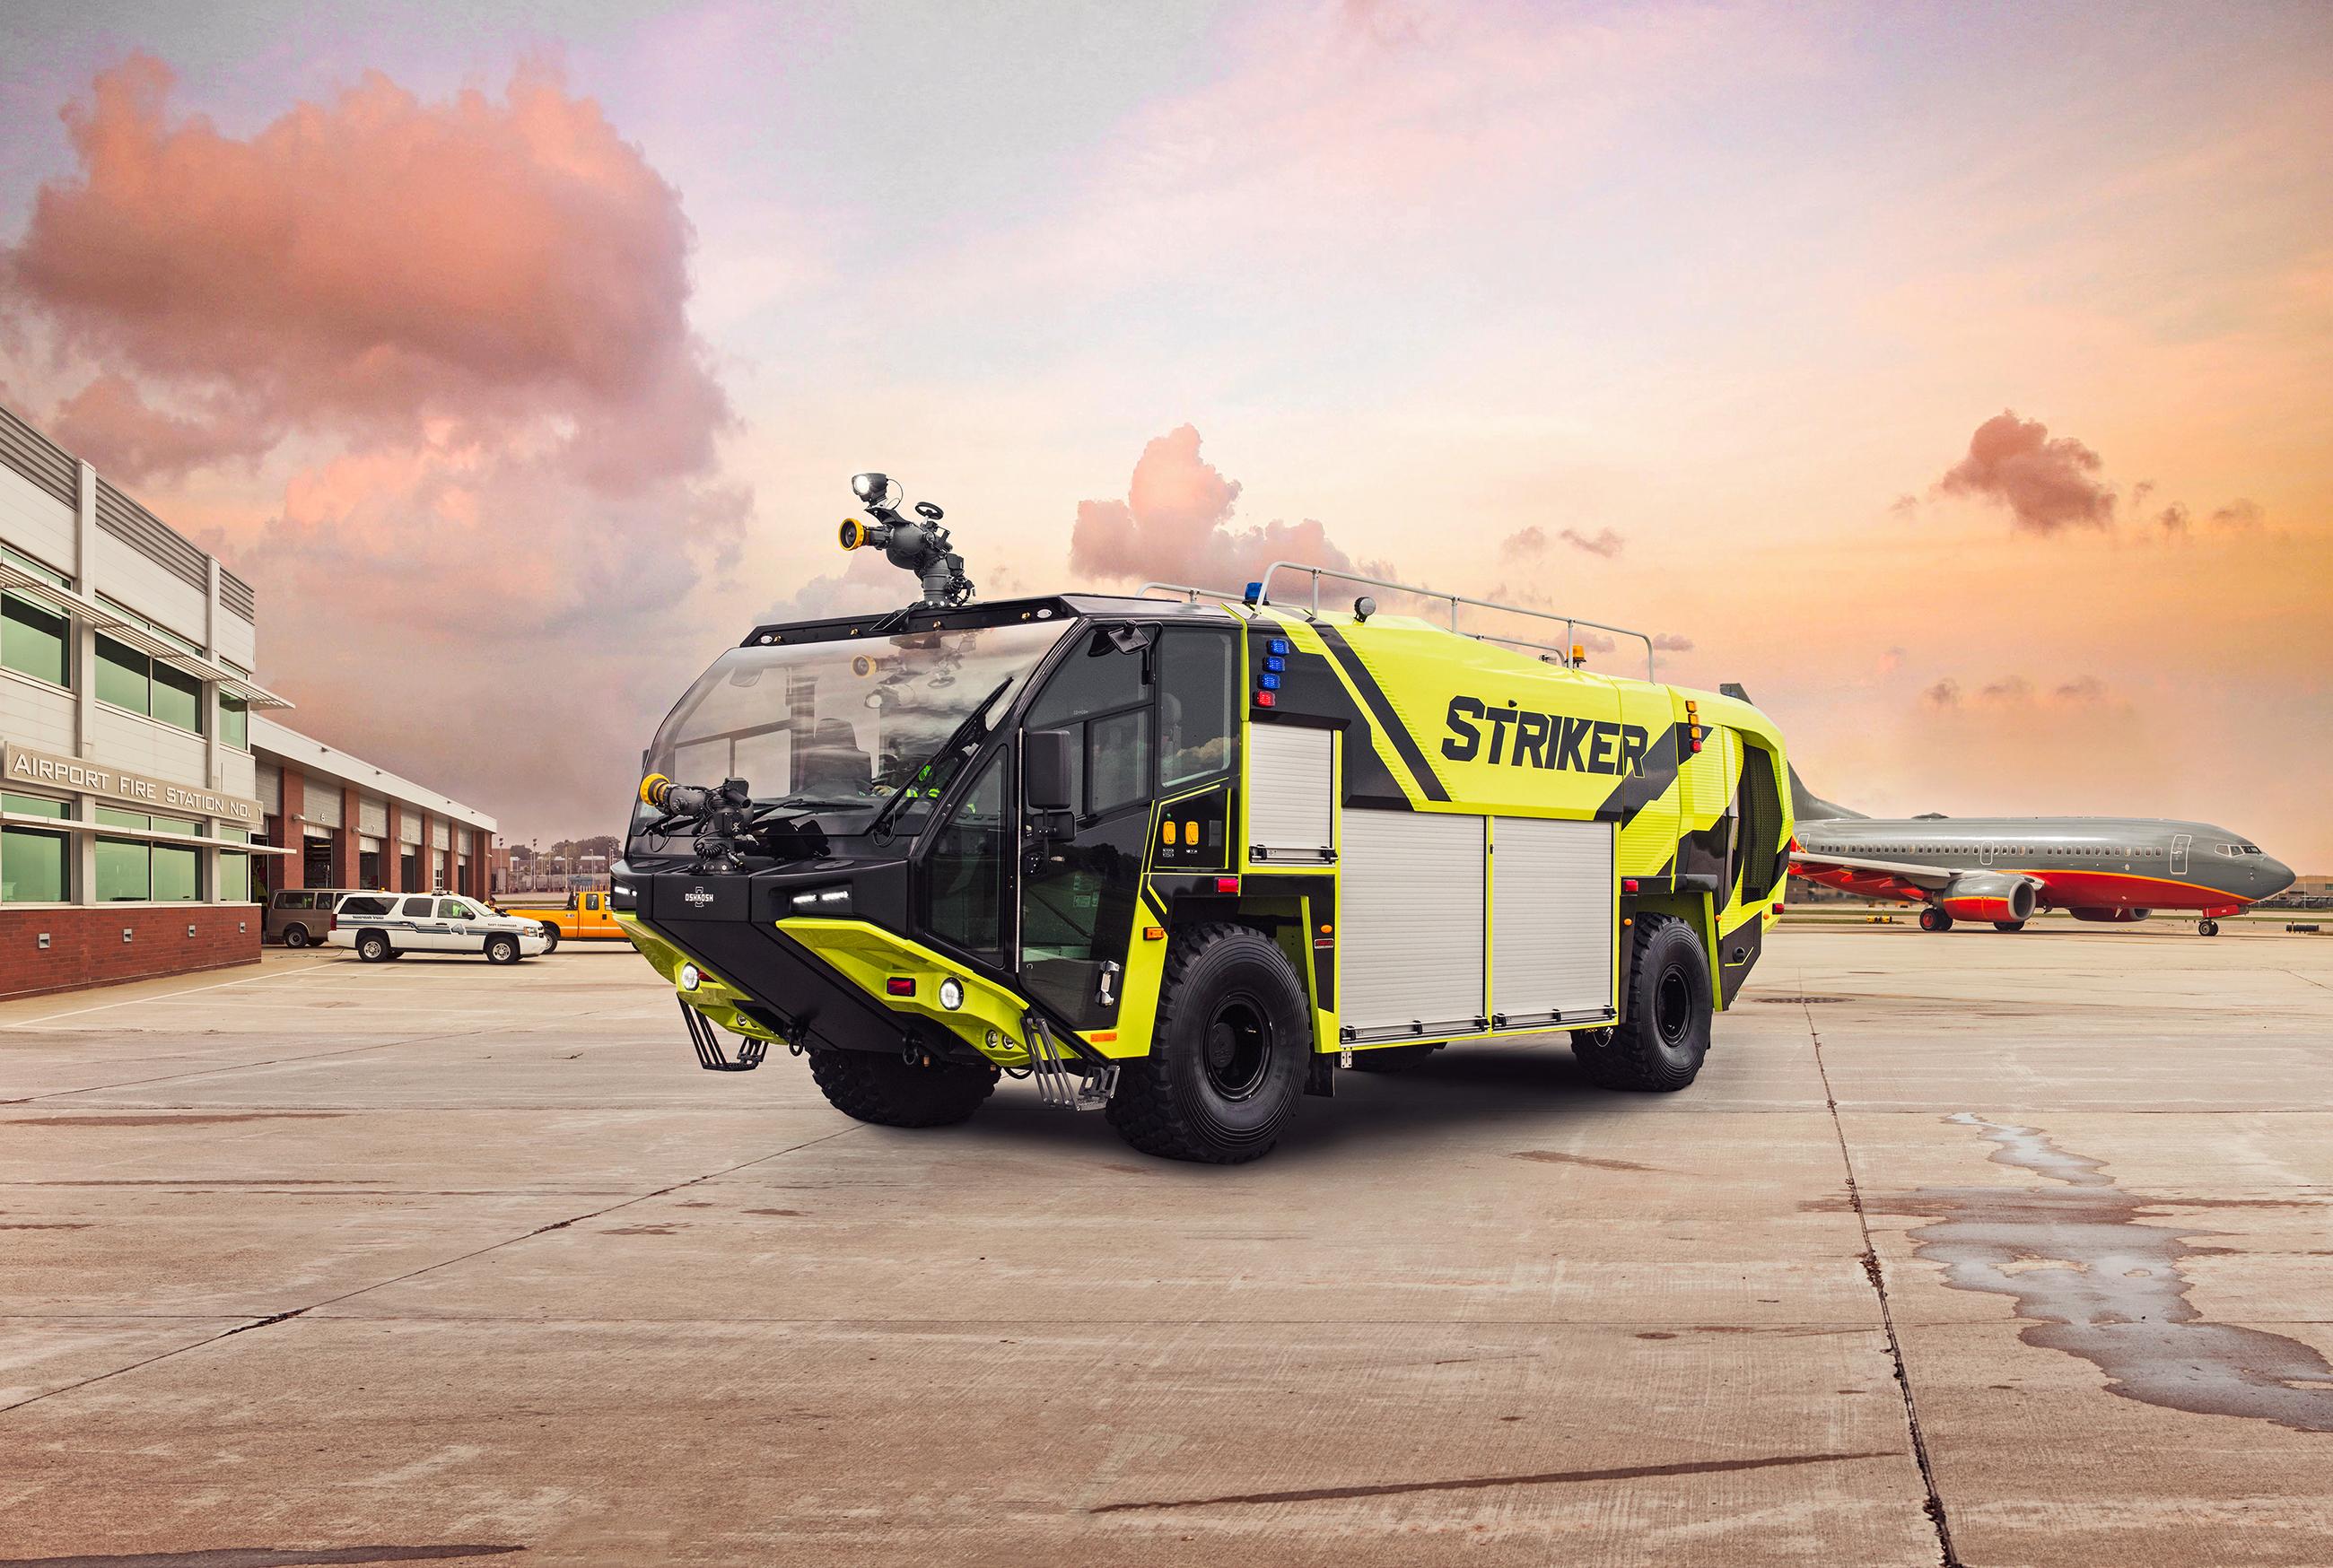 ARFF Striker 4x4 Airport Runway